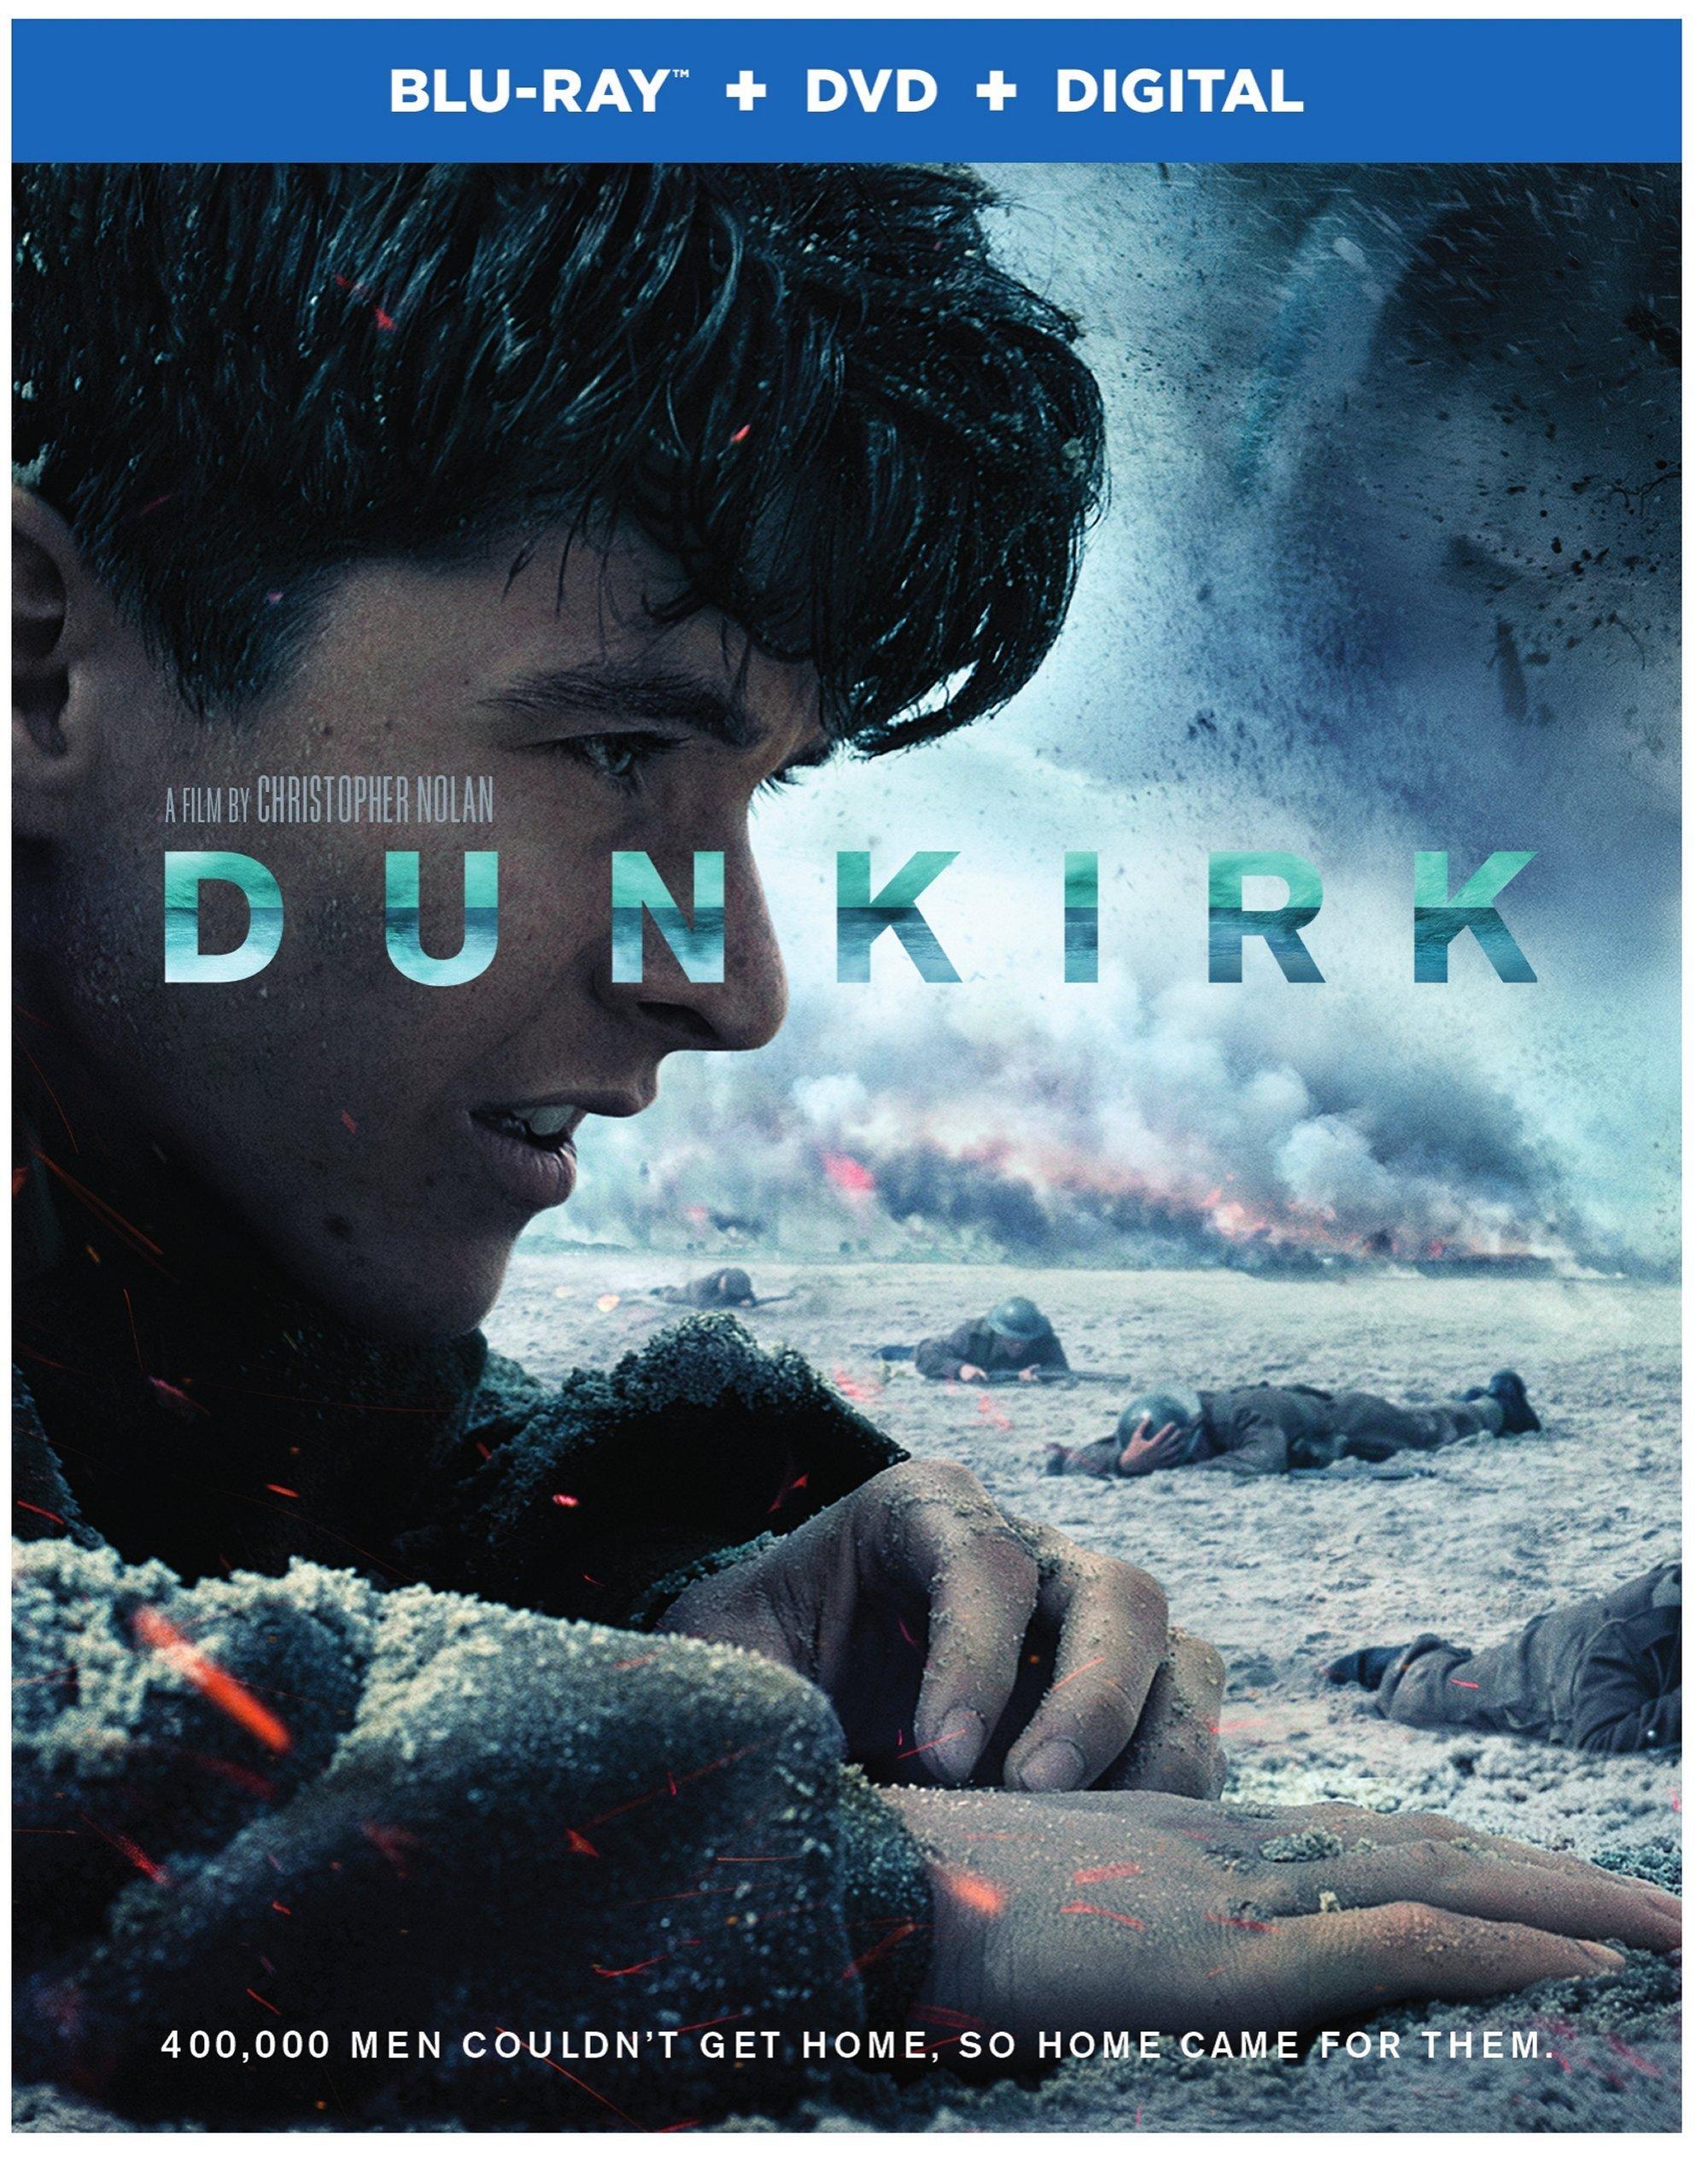 Warner Home Video Dunkirk (2017) (Blu-ray + DVD + Digital)